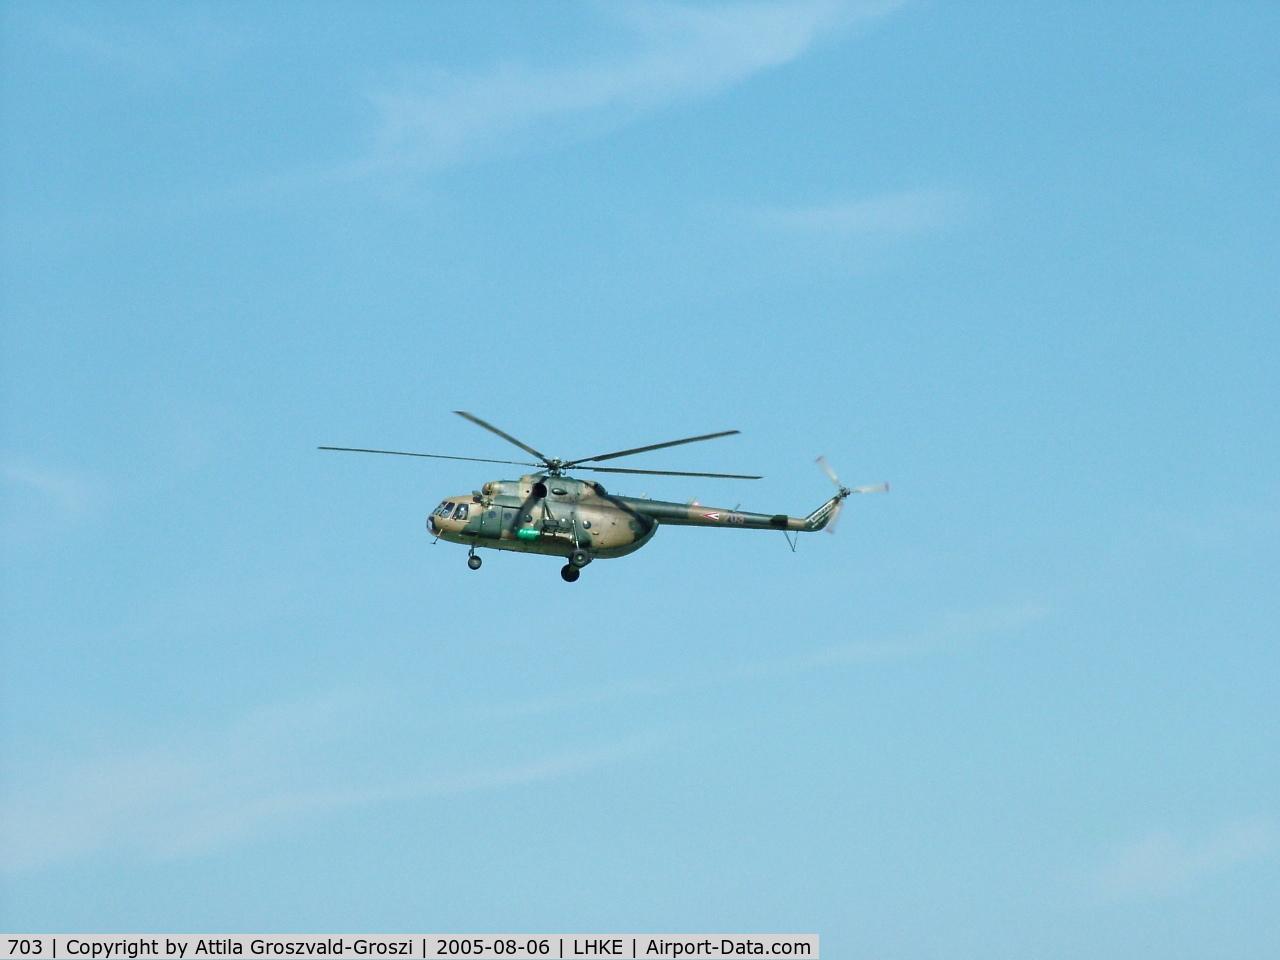 703, 1987 Mil Mi-17N C/N 104M03, Kecskemét, Hungarian Air-Forces Base - Airshow '2005